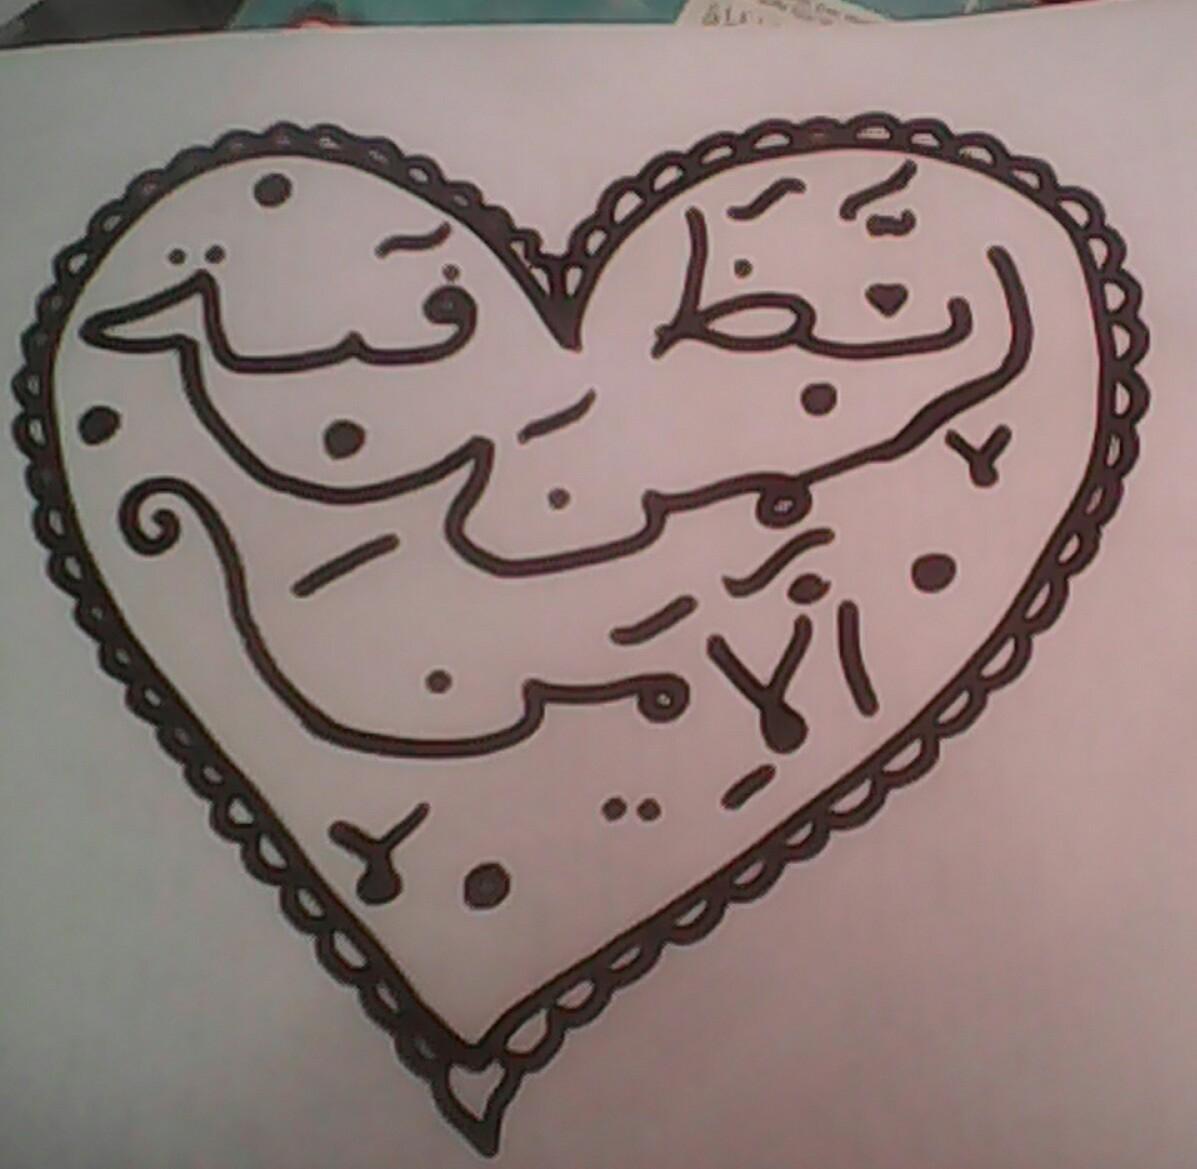 Contoh Kaligrafi Arab Hubbul Wathon Minal Iman Contoh